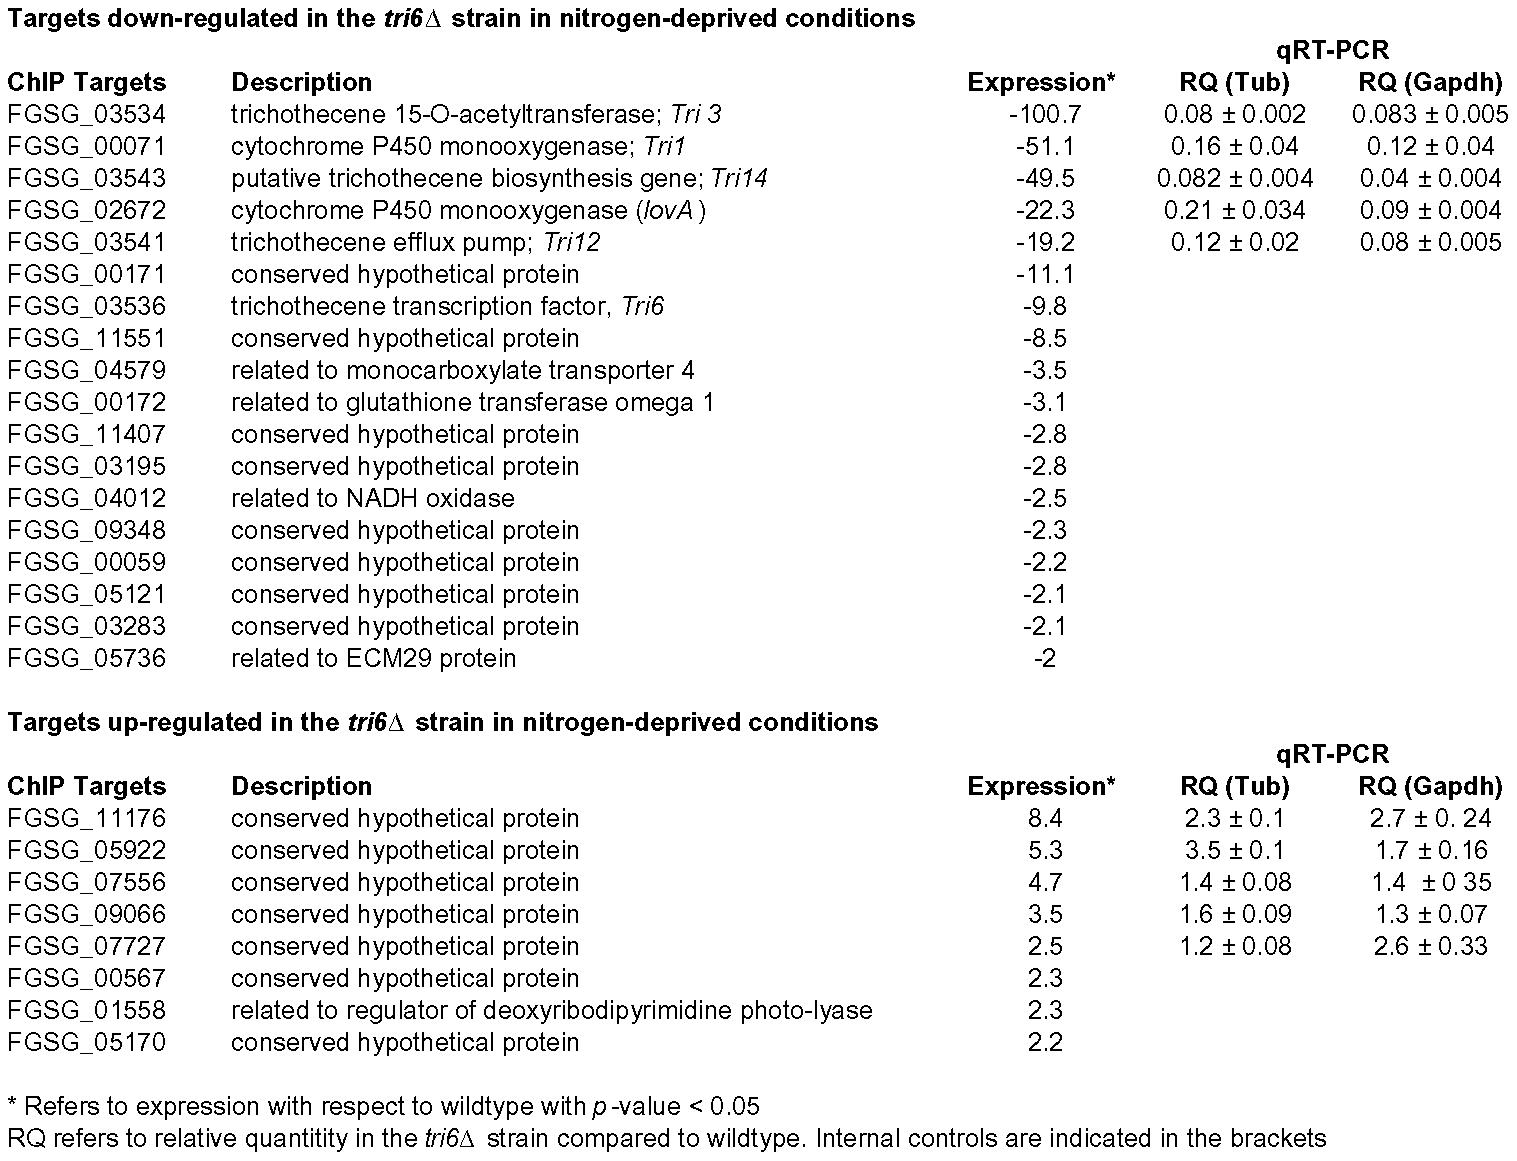 <i>Tri6</i> differentially regulates 26 targets under nitrogen-deprived conditions.